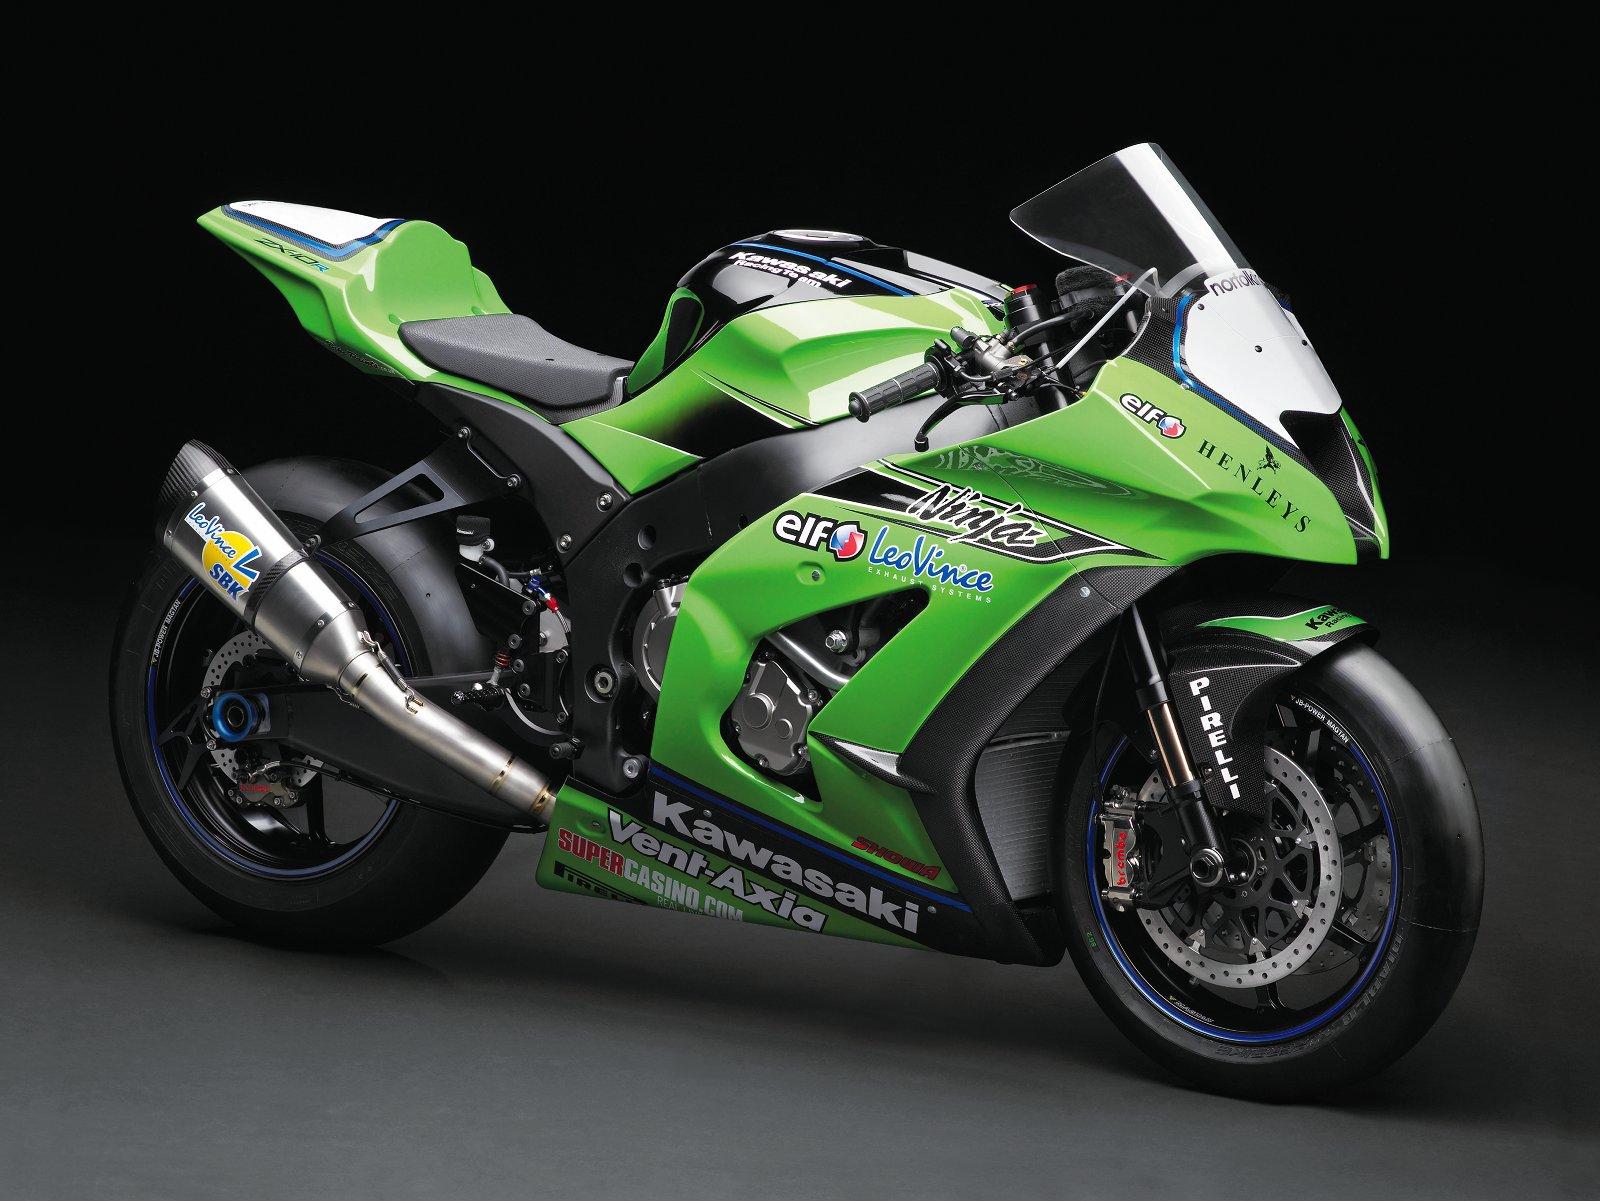 2011 Kawasaki Zx 10r Best Motorcycles